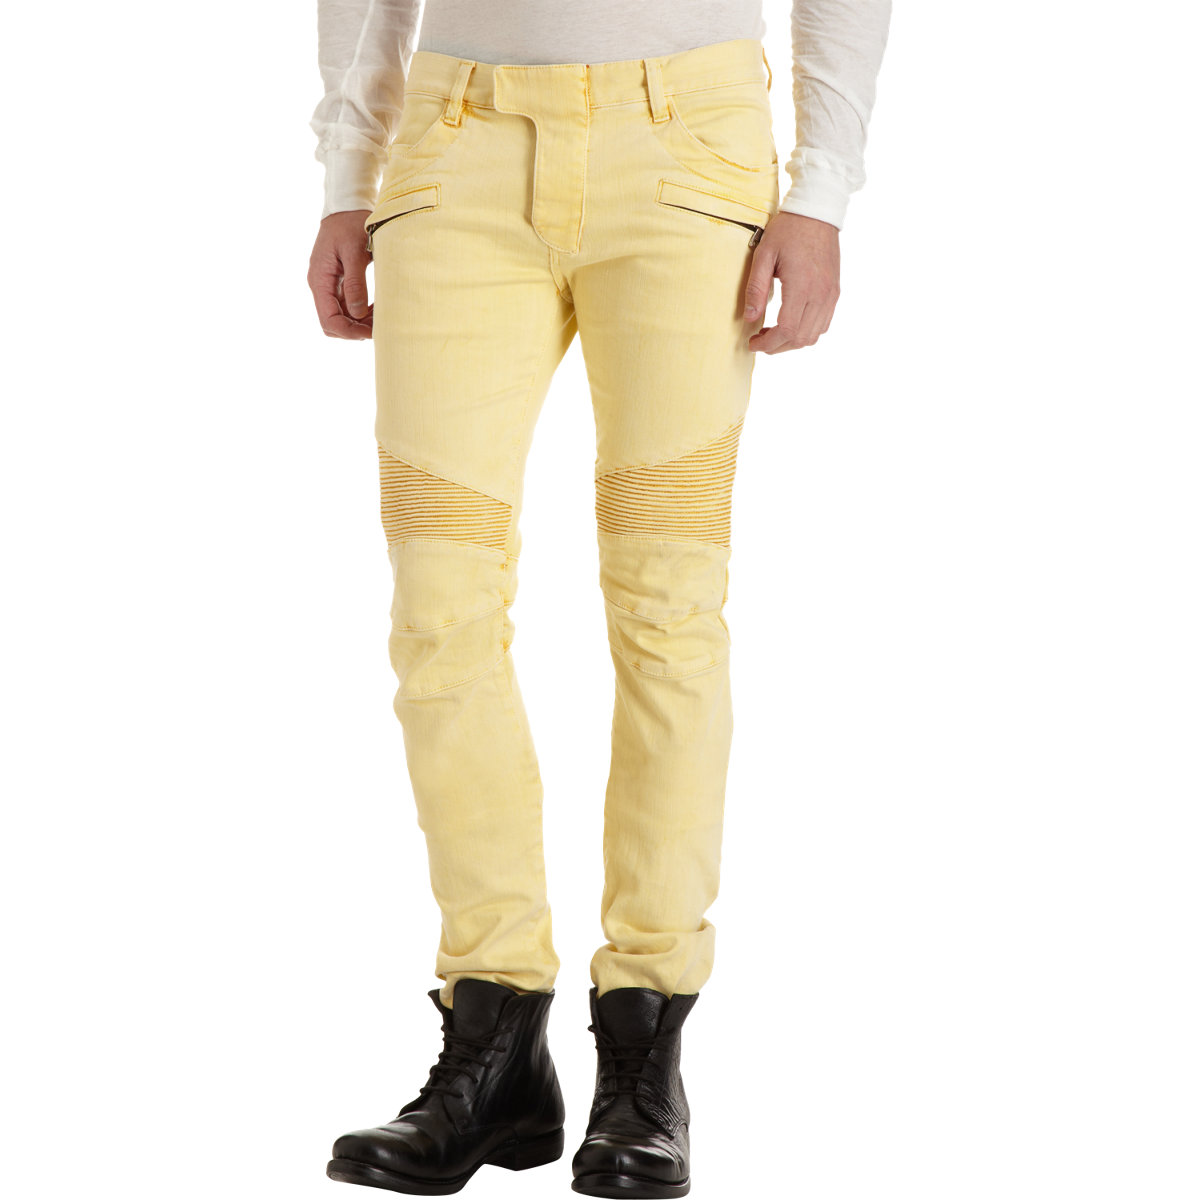 cdd5b700 Balmain Biker Jean in Yellow for Men - Lyst